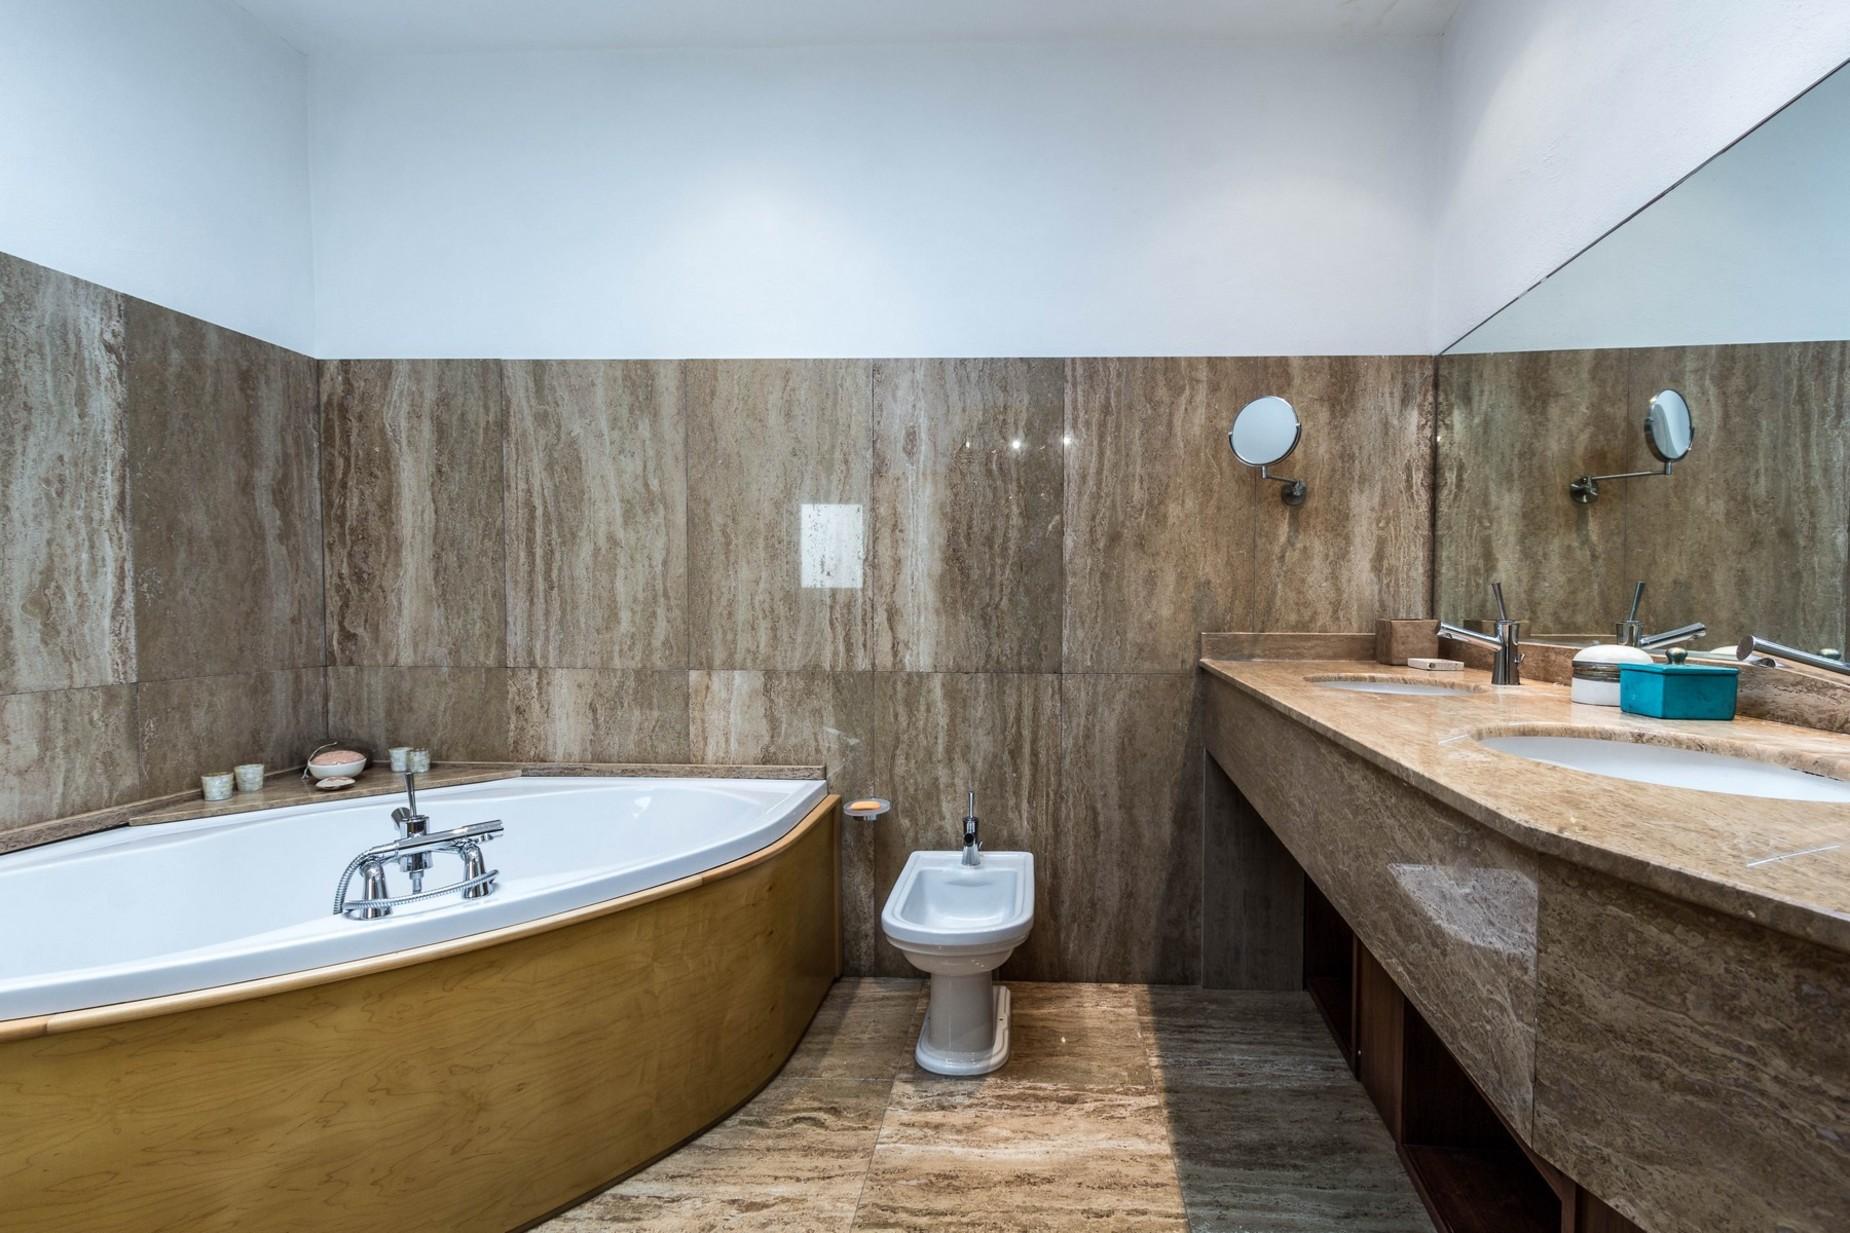 4 bed Villa For Sale in Gharghur, Gharghur - thumb 17